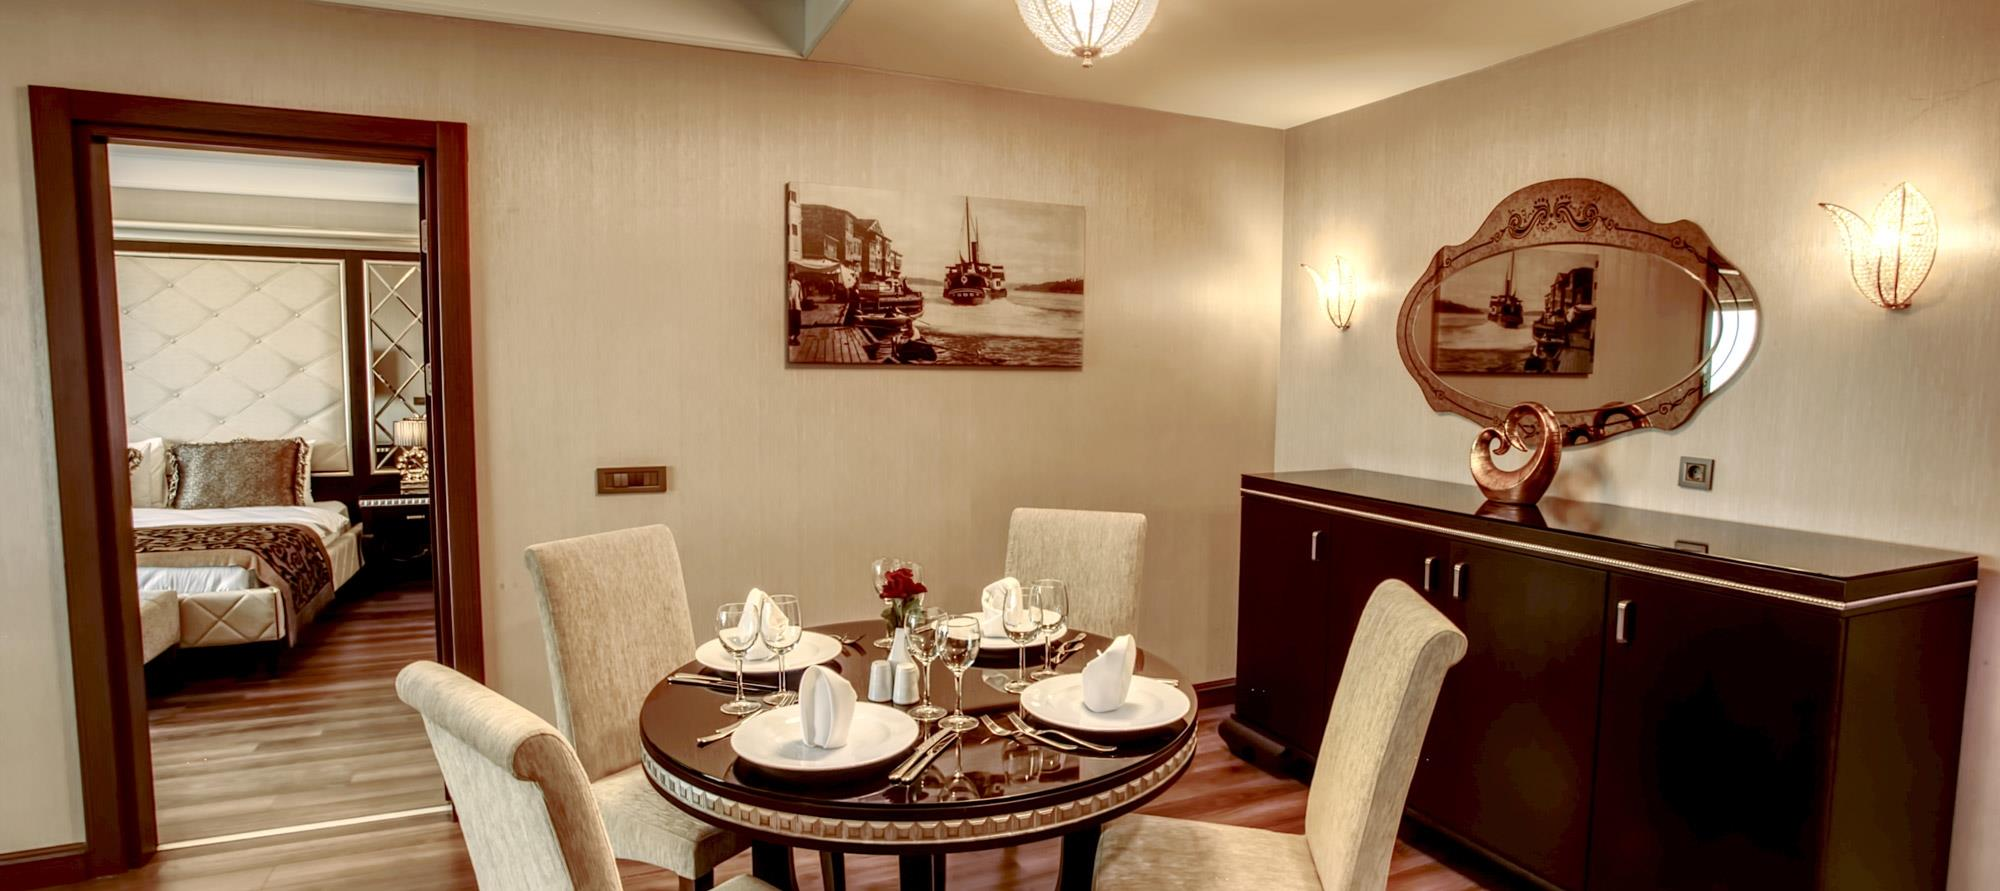 Grand Makel Hotel Topkapi254624